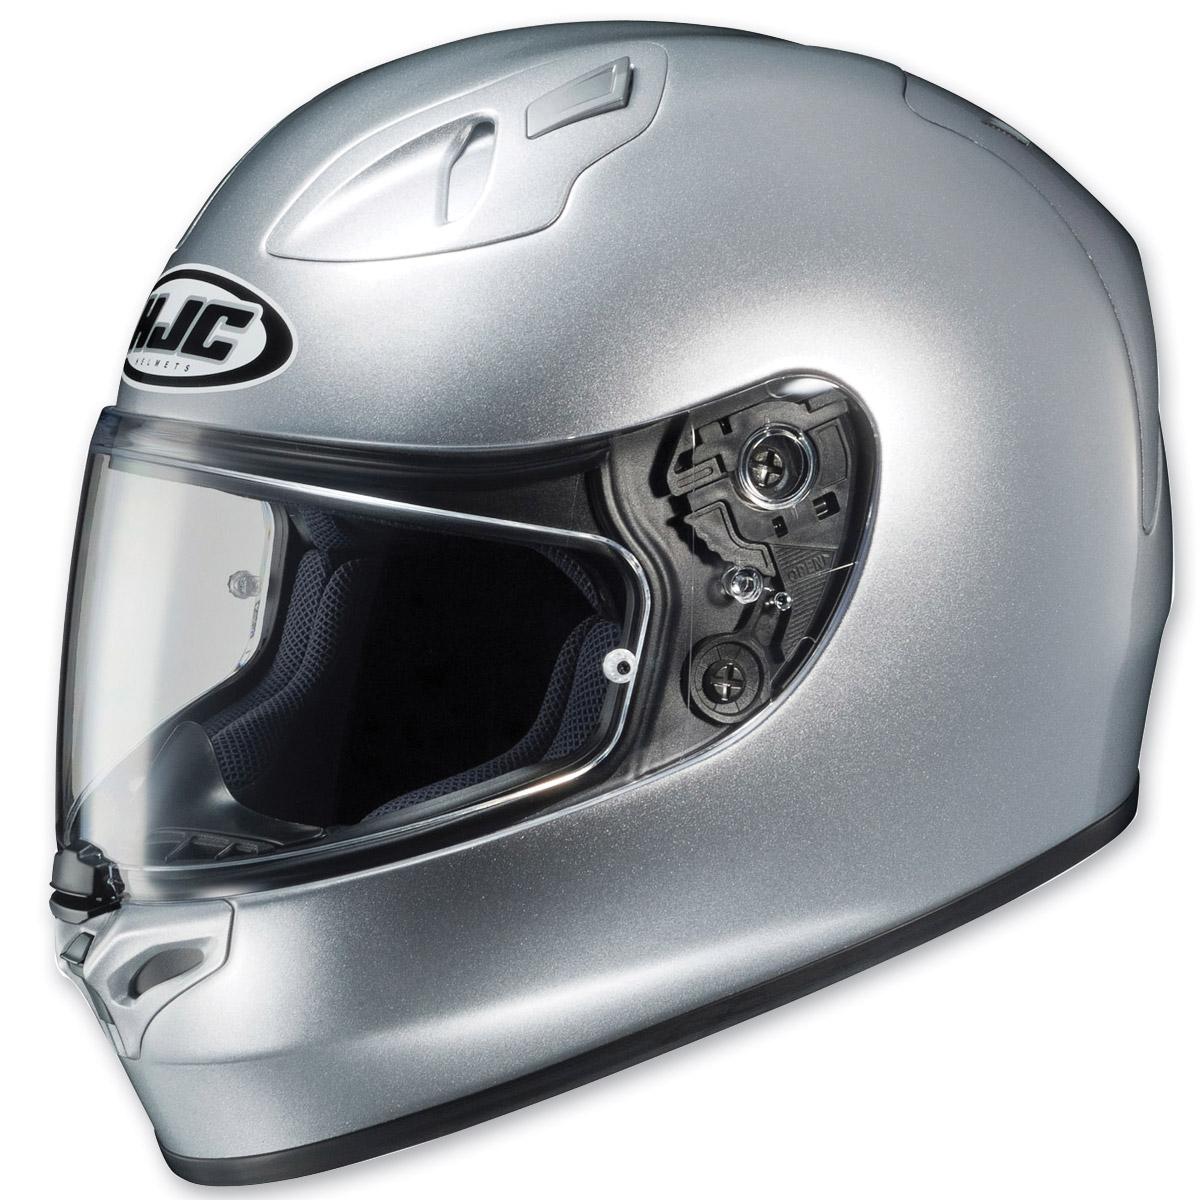 hjc fg 17 silver full face helmet 722 072 j p cycles. Black Bedroom Furniture Sets. Home Design Ideas